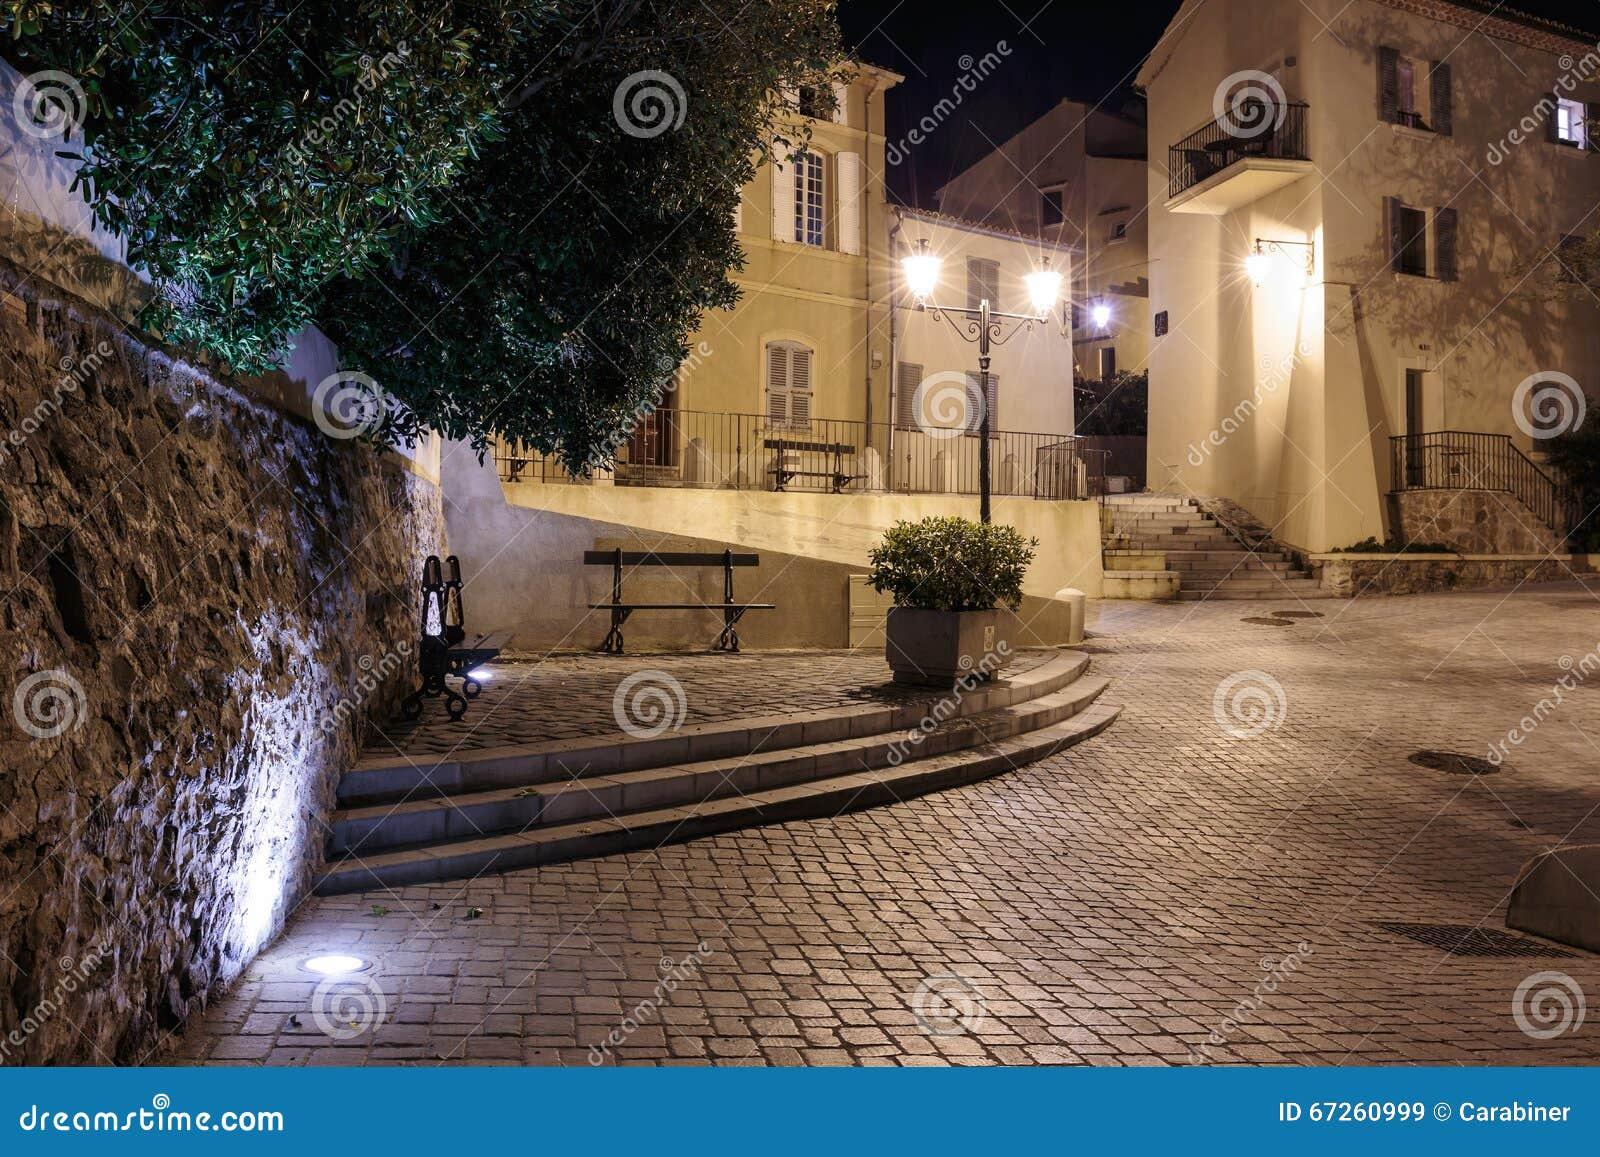 Narrow old street at night in Saint-Tropez.